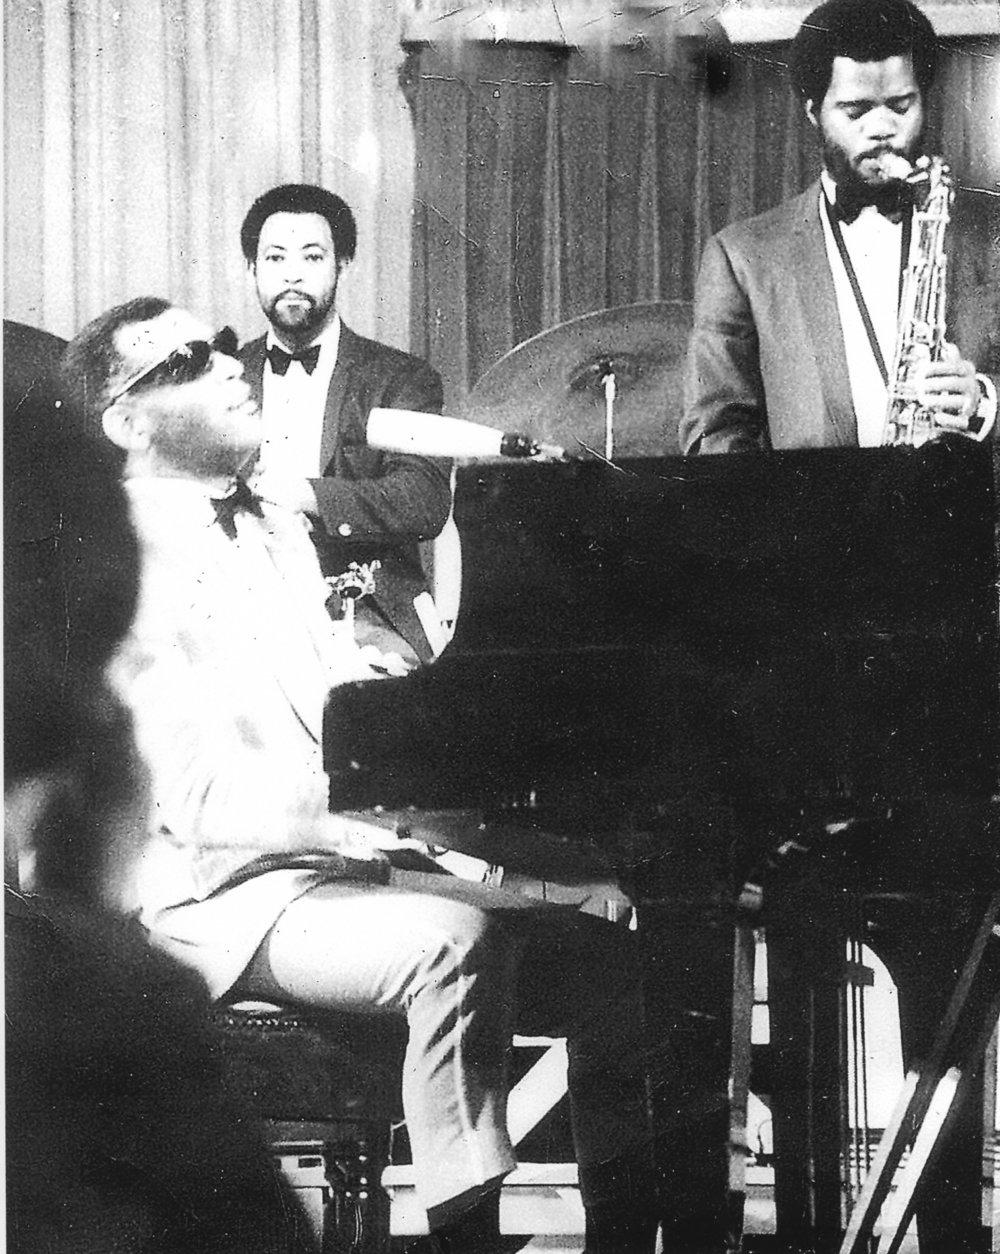 Ray Charles, Ernie Elly and John Cloyd Miller